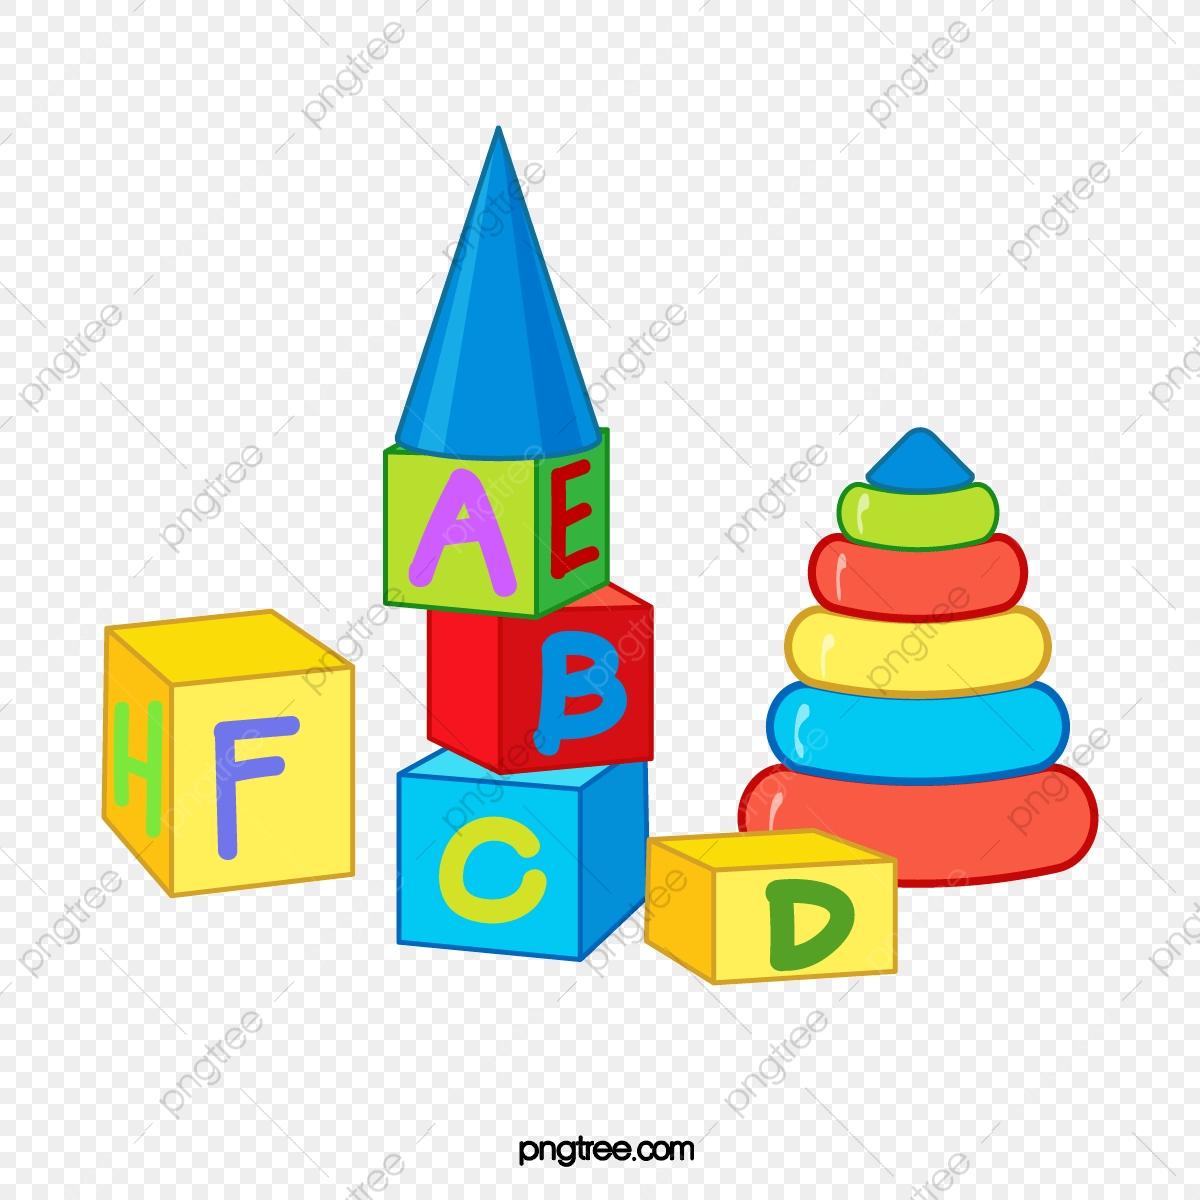 Abc Blocks, Building Blocks, Toy, Game PNG Transparent Clipart Image.